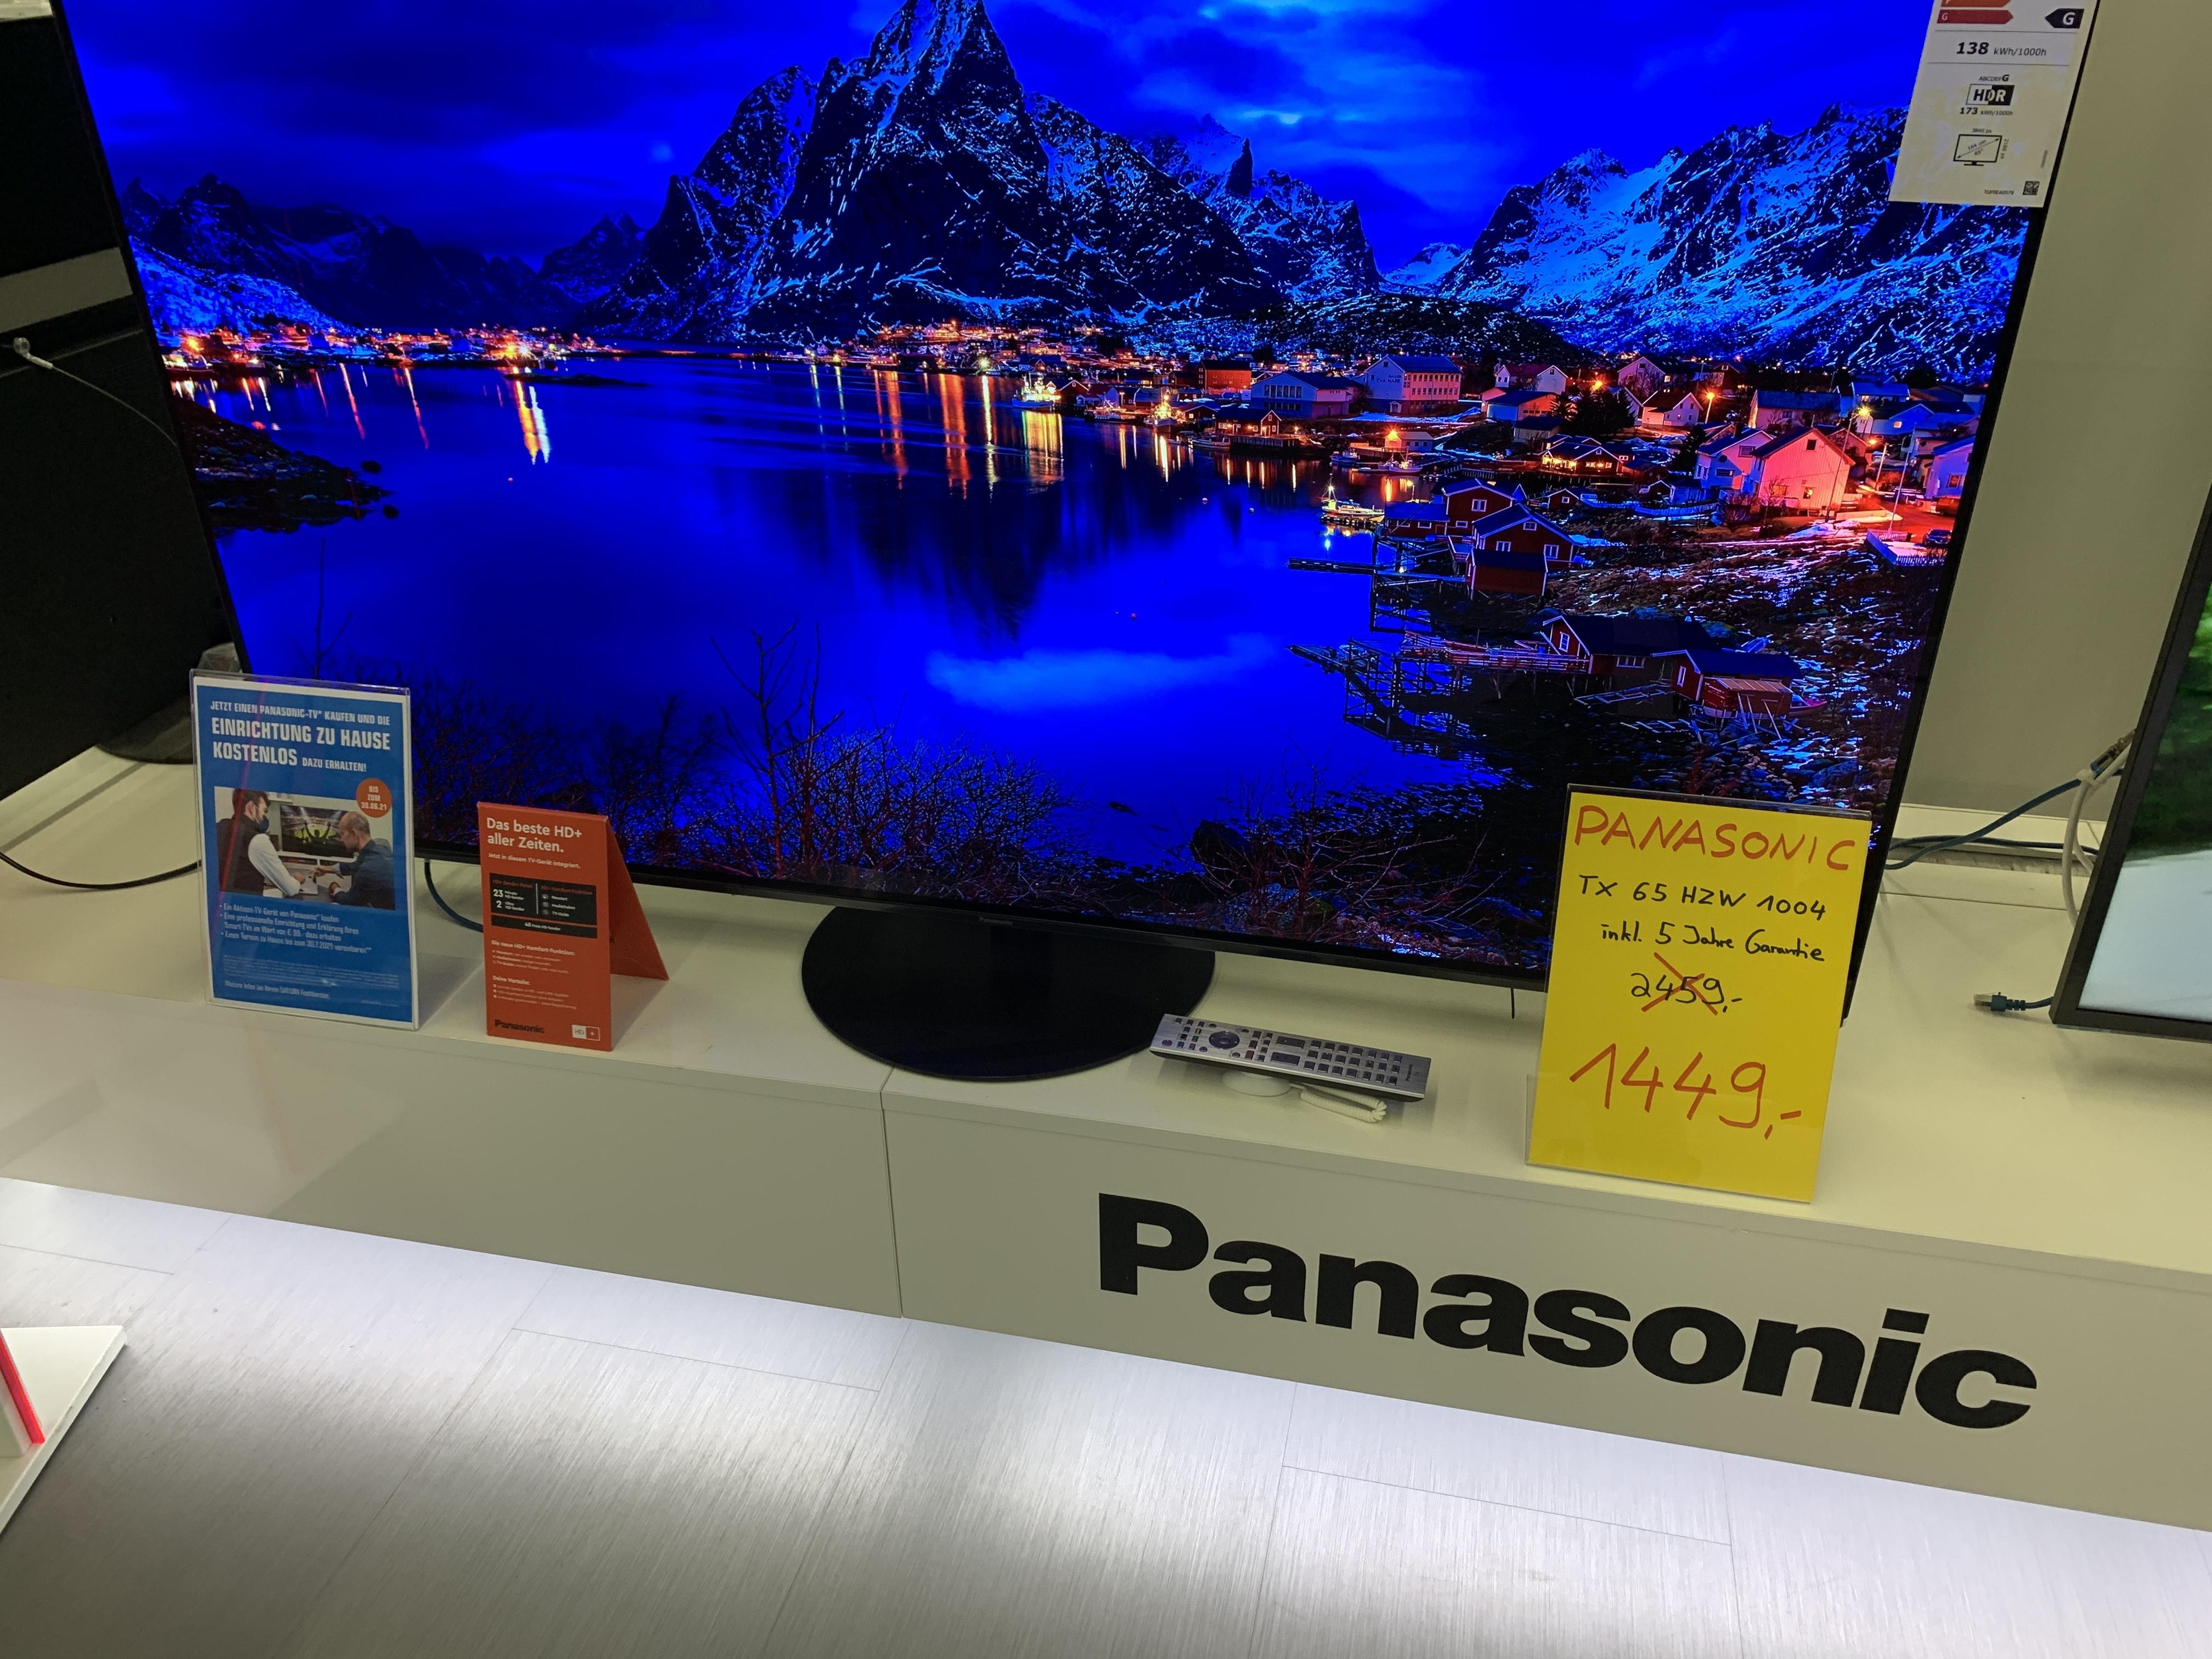 [Saturn Leverkusen] Panasonic Aussteller!? Sammeldeal, Bsp. TX 65 HZW 1004 OLED TV inkl. 5 Jahre Garantie